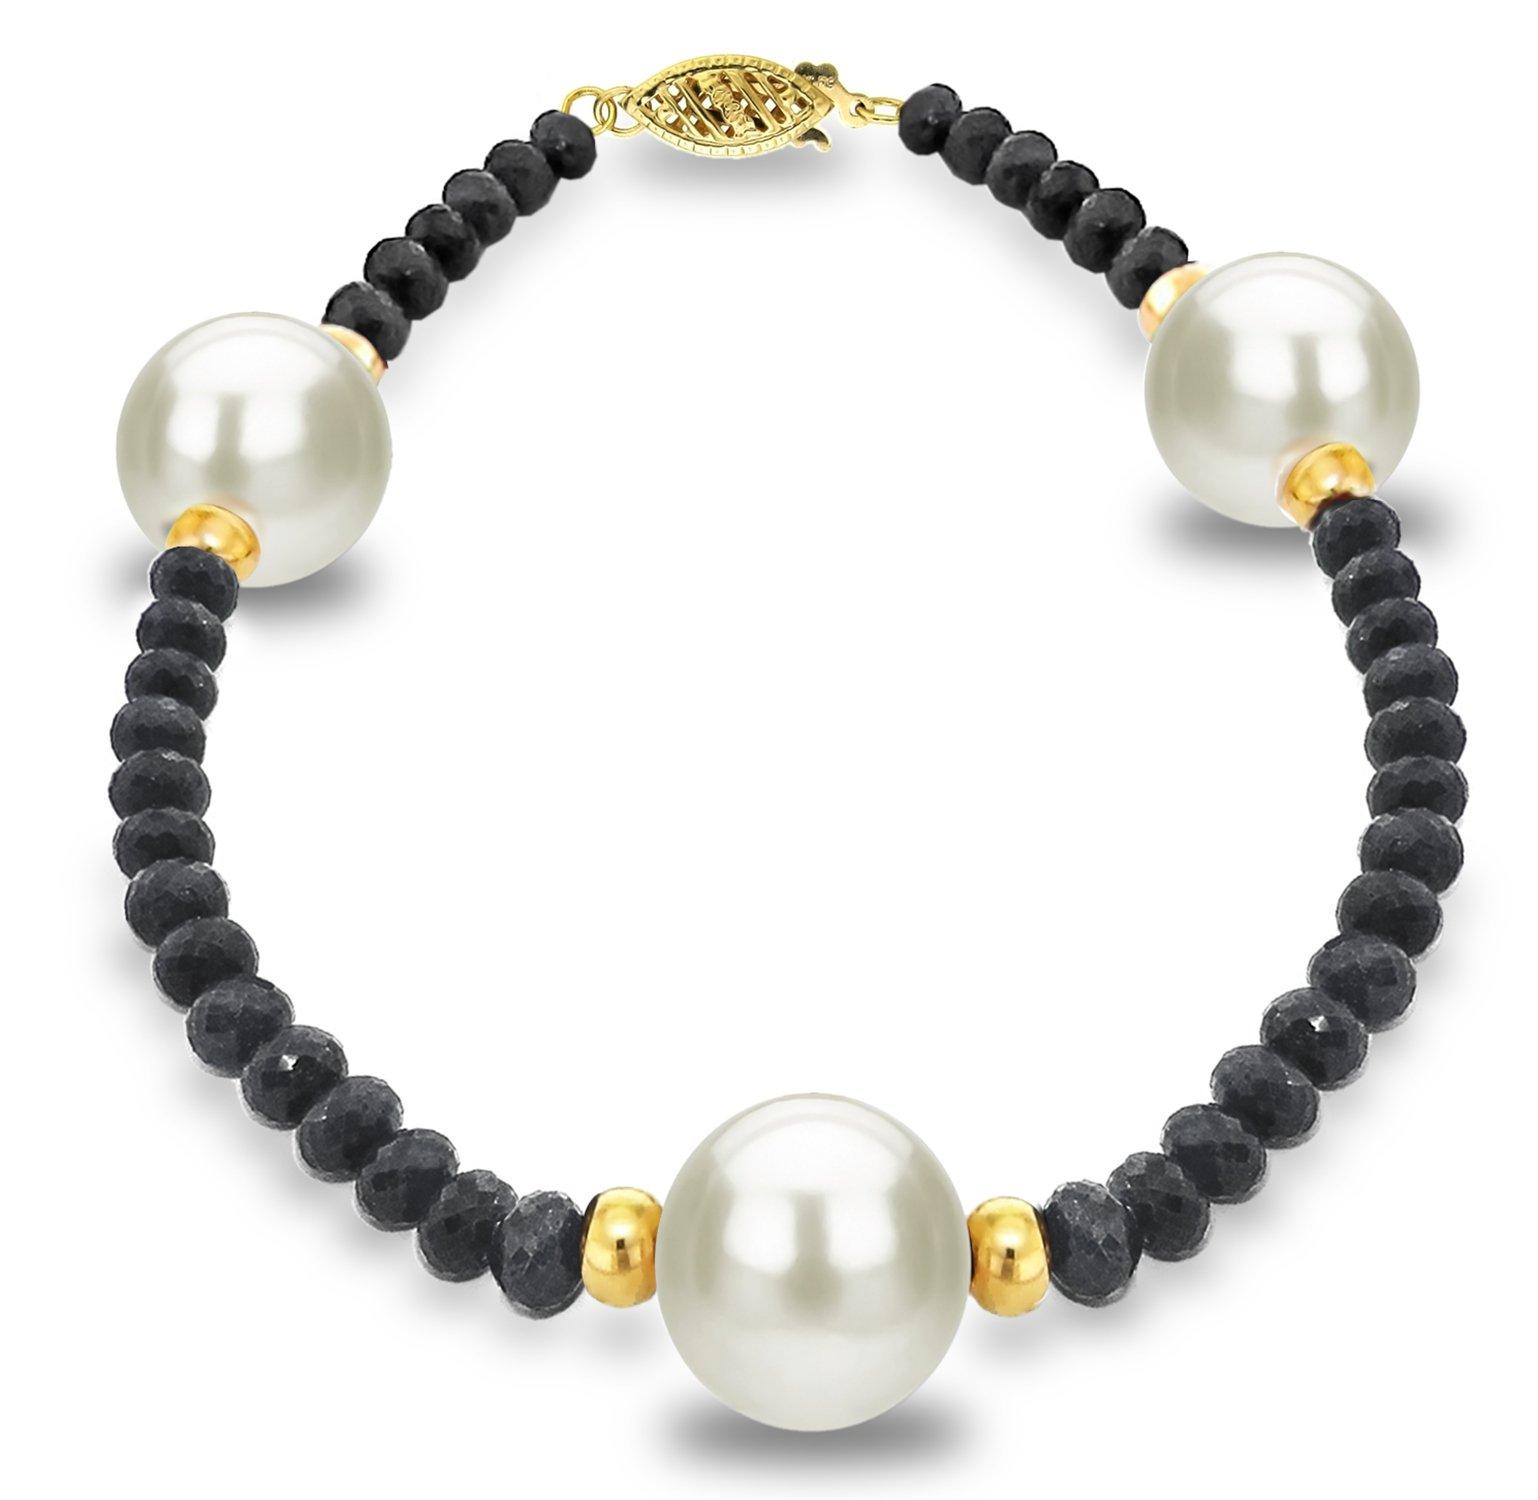 14k Yellow Gold 9-9.5mm White Freshwater Cultured Pearl 4mm Black Spinel Bracelet, 7.25''